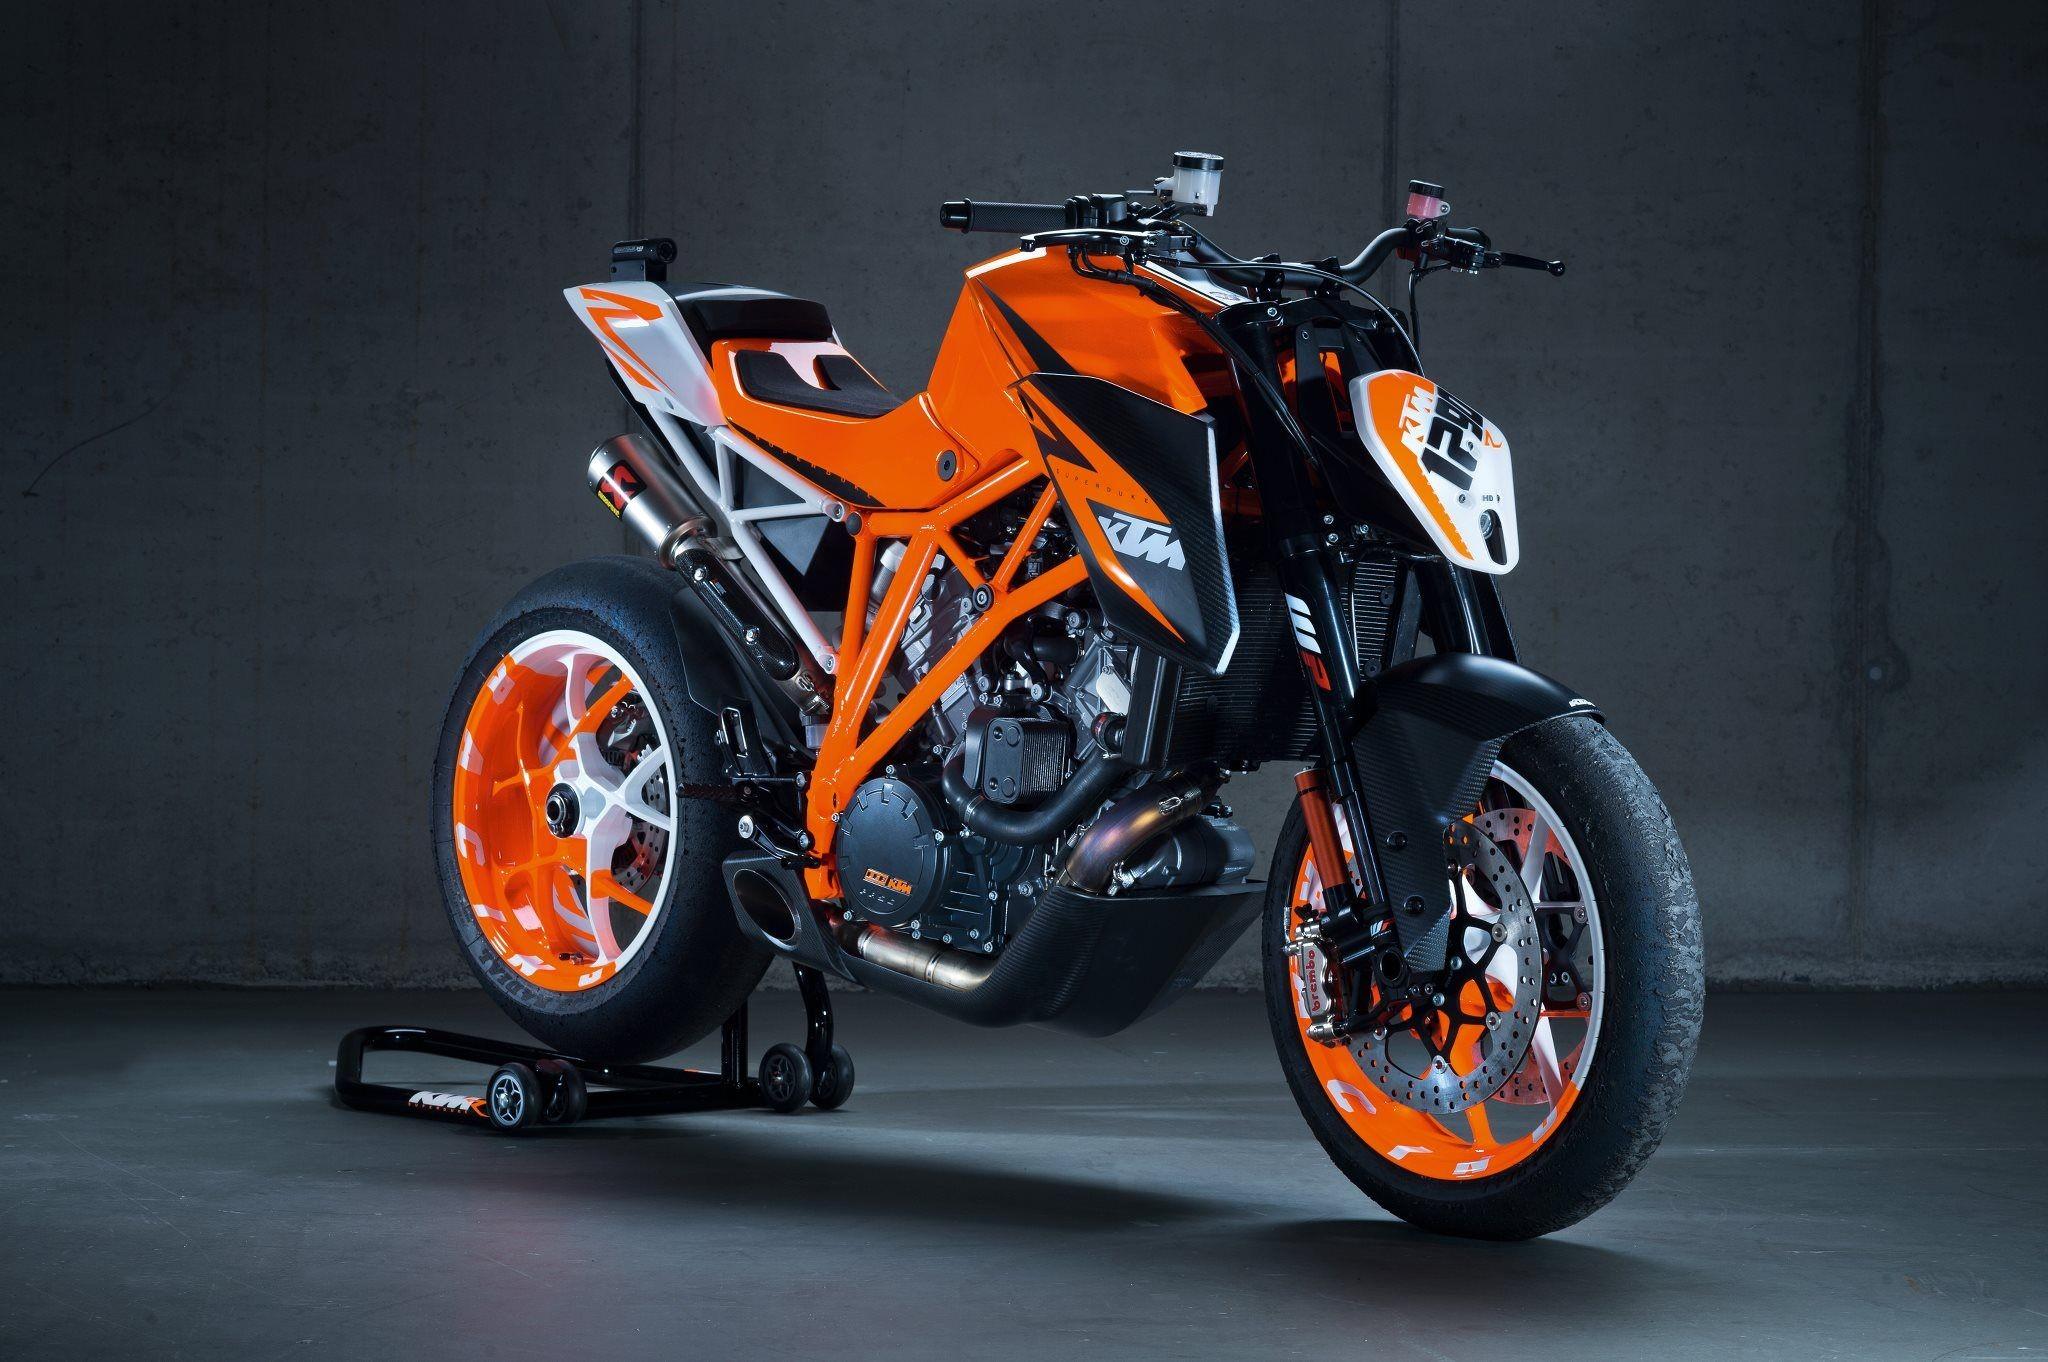 2048x1362 KTM Bike Wallpaper Pictures 10252 Download